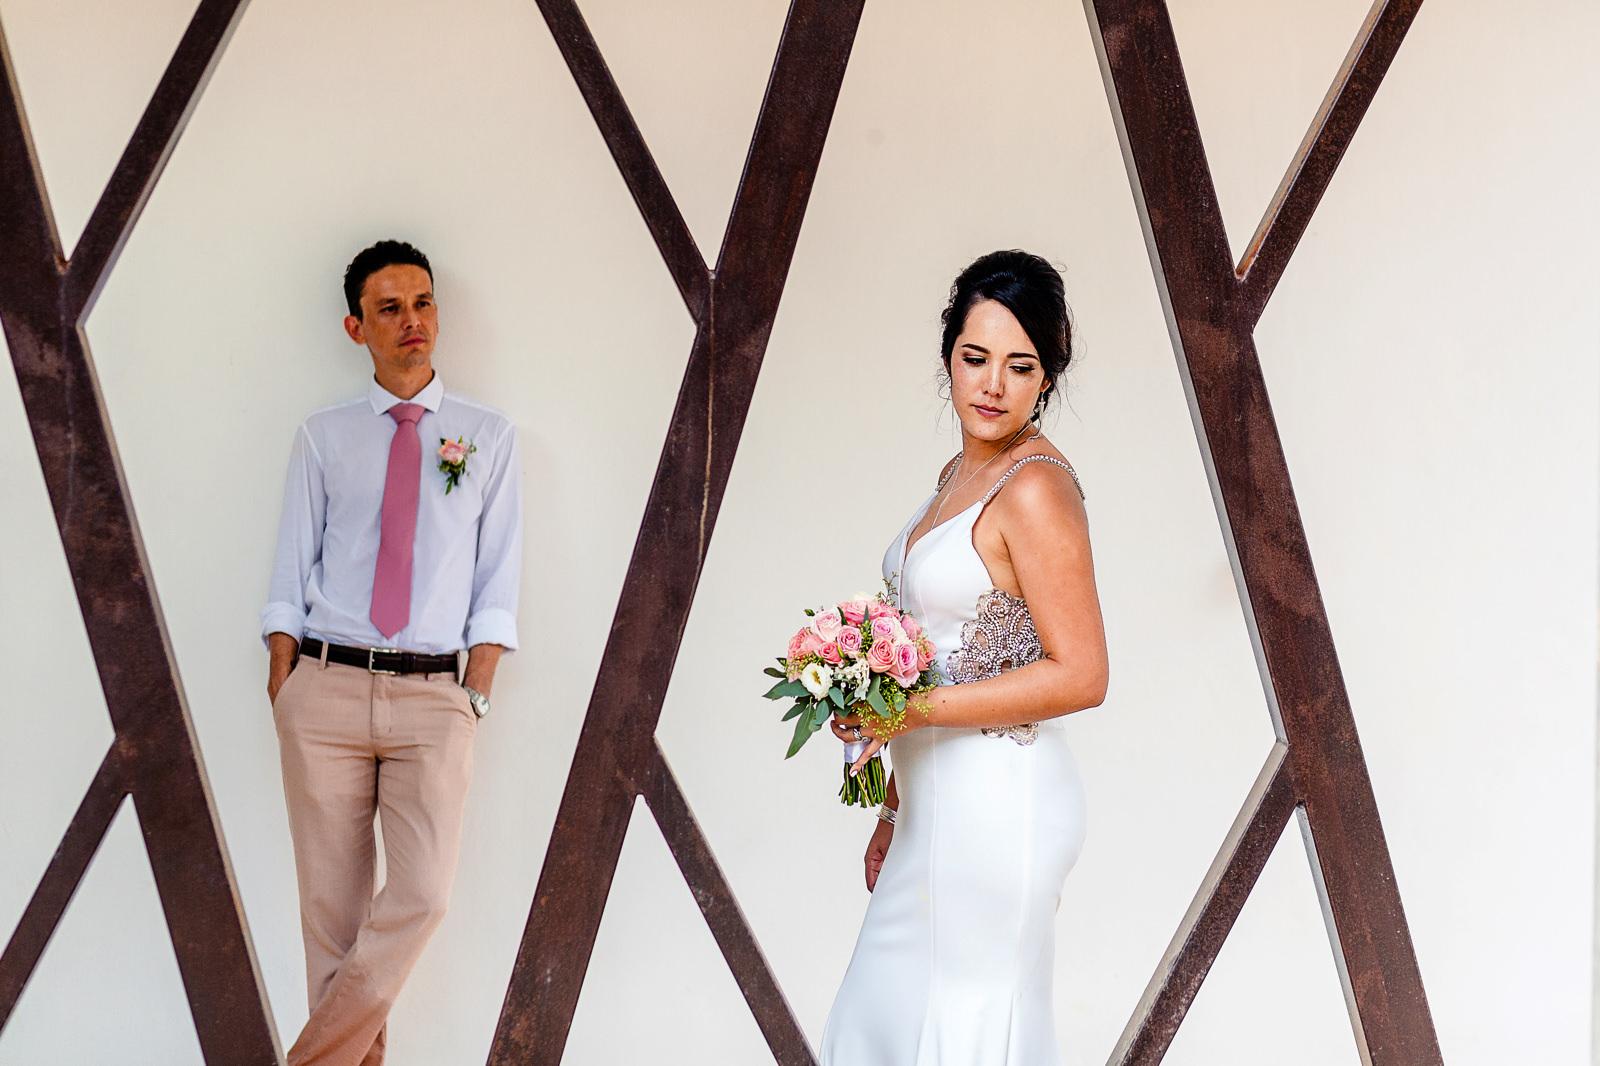 Bride and groom standing between geometrical metal structures.